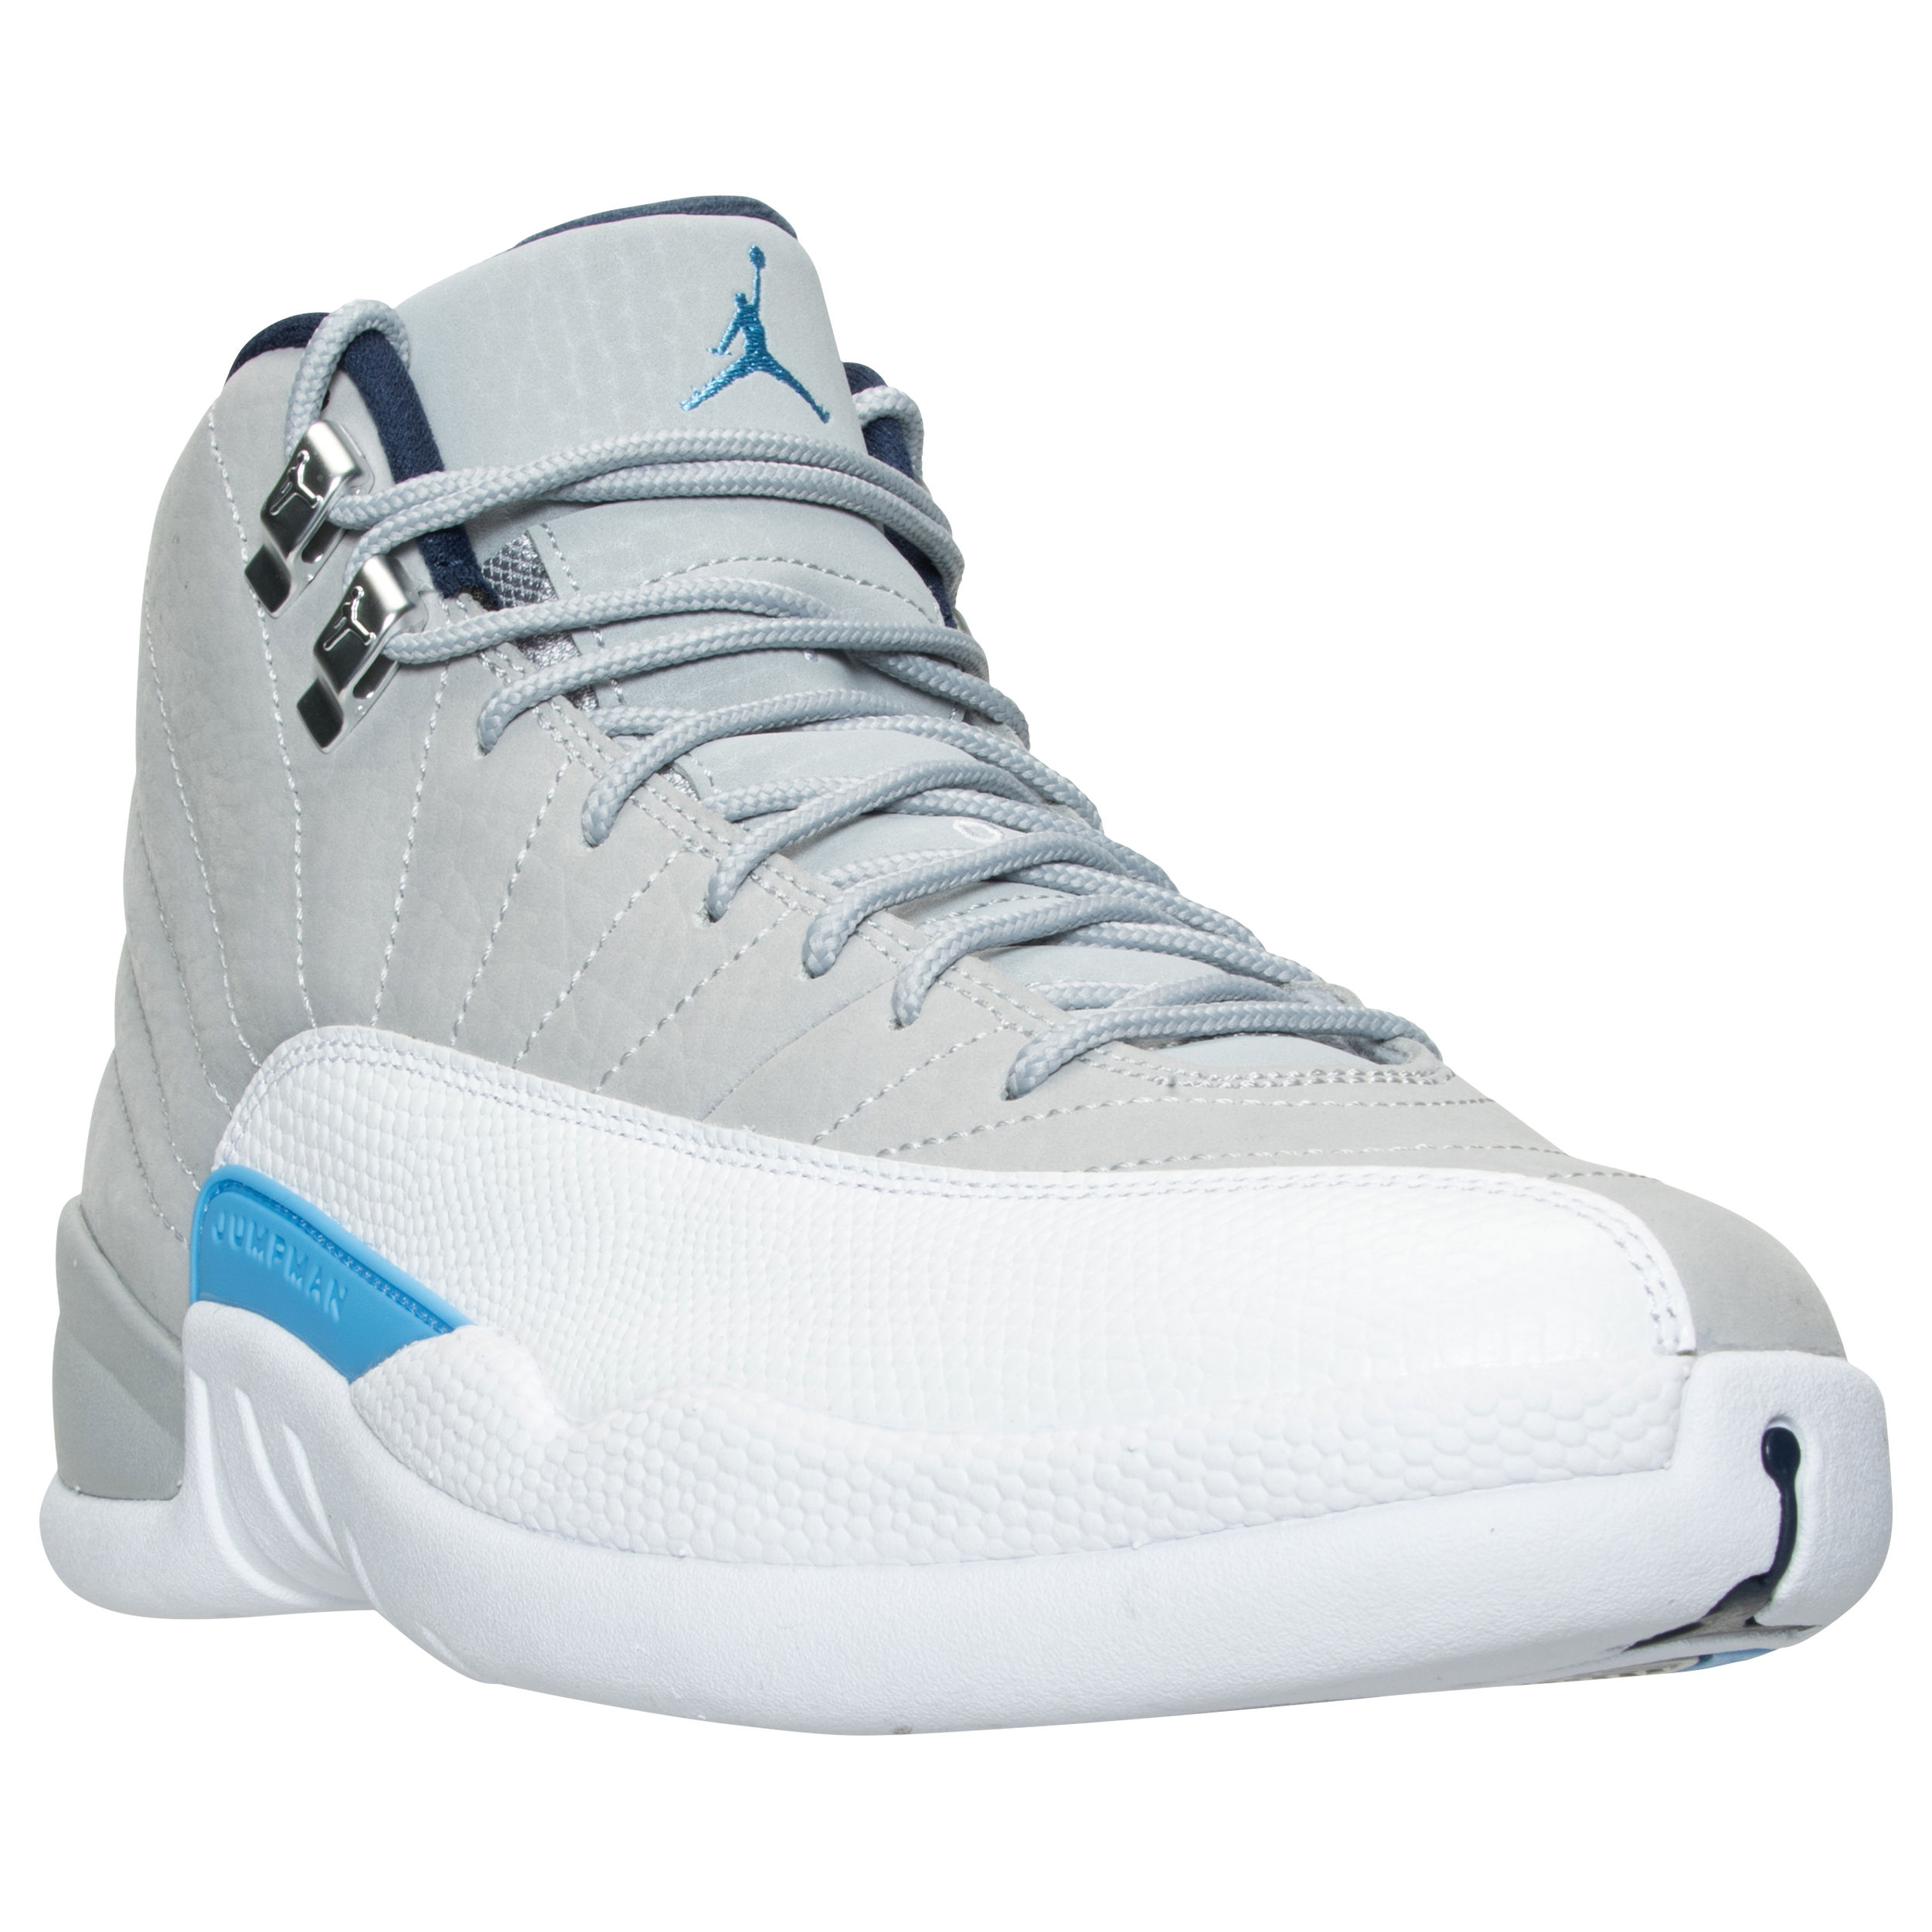 268d9554413 Nike Air Jordan 11 Malaysia Online Shop | CTT